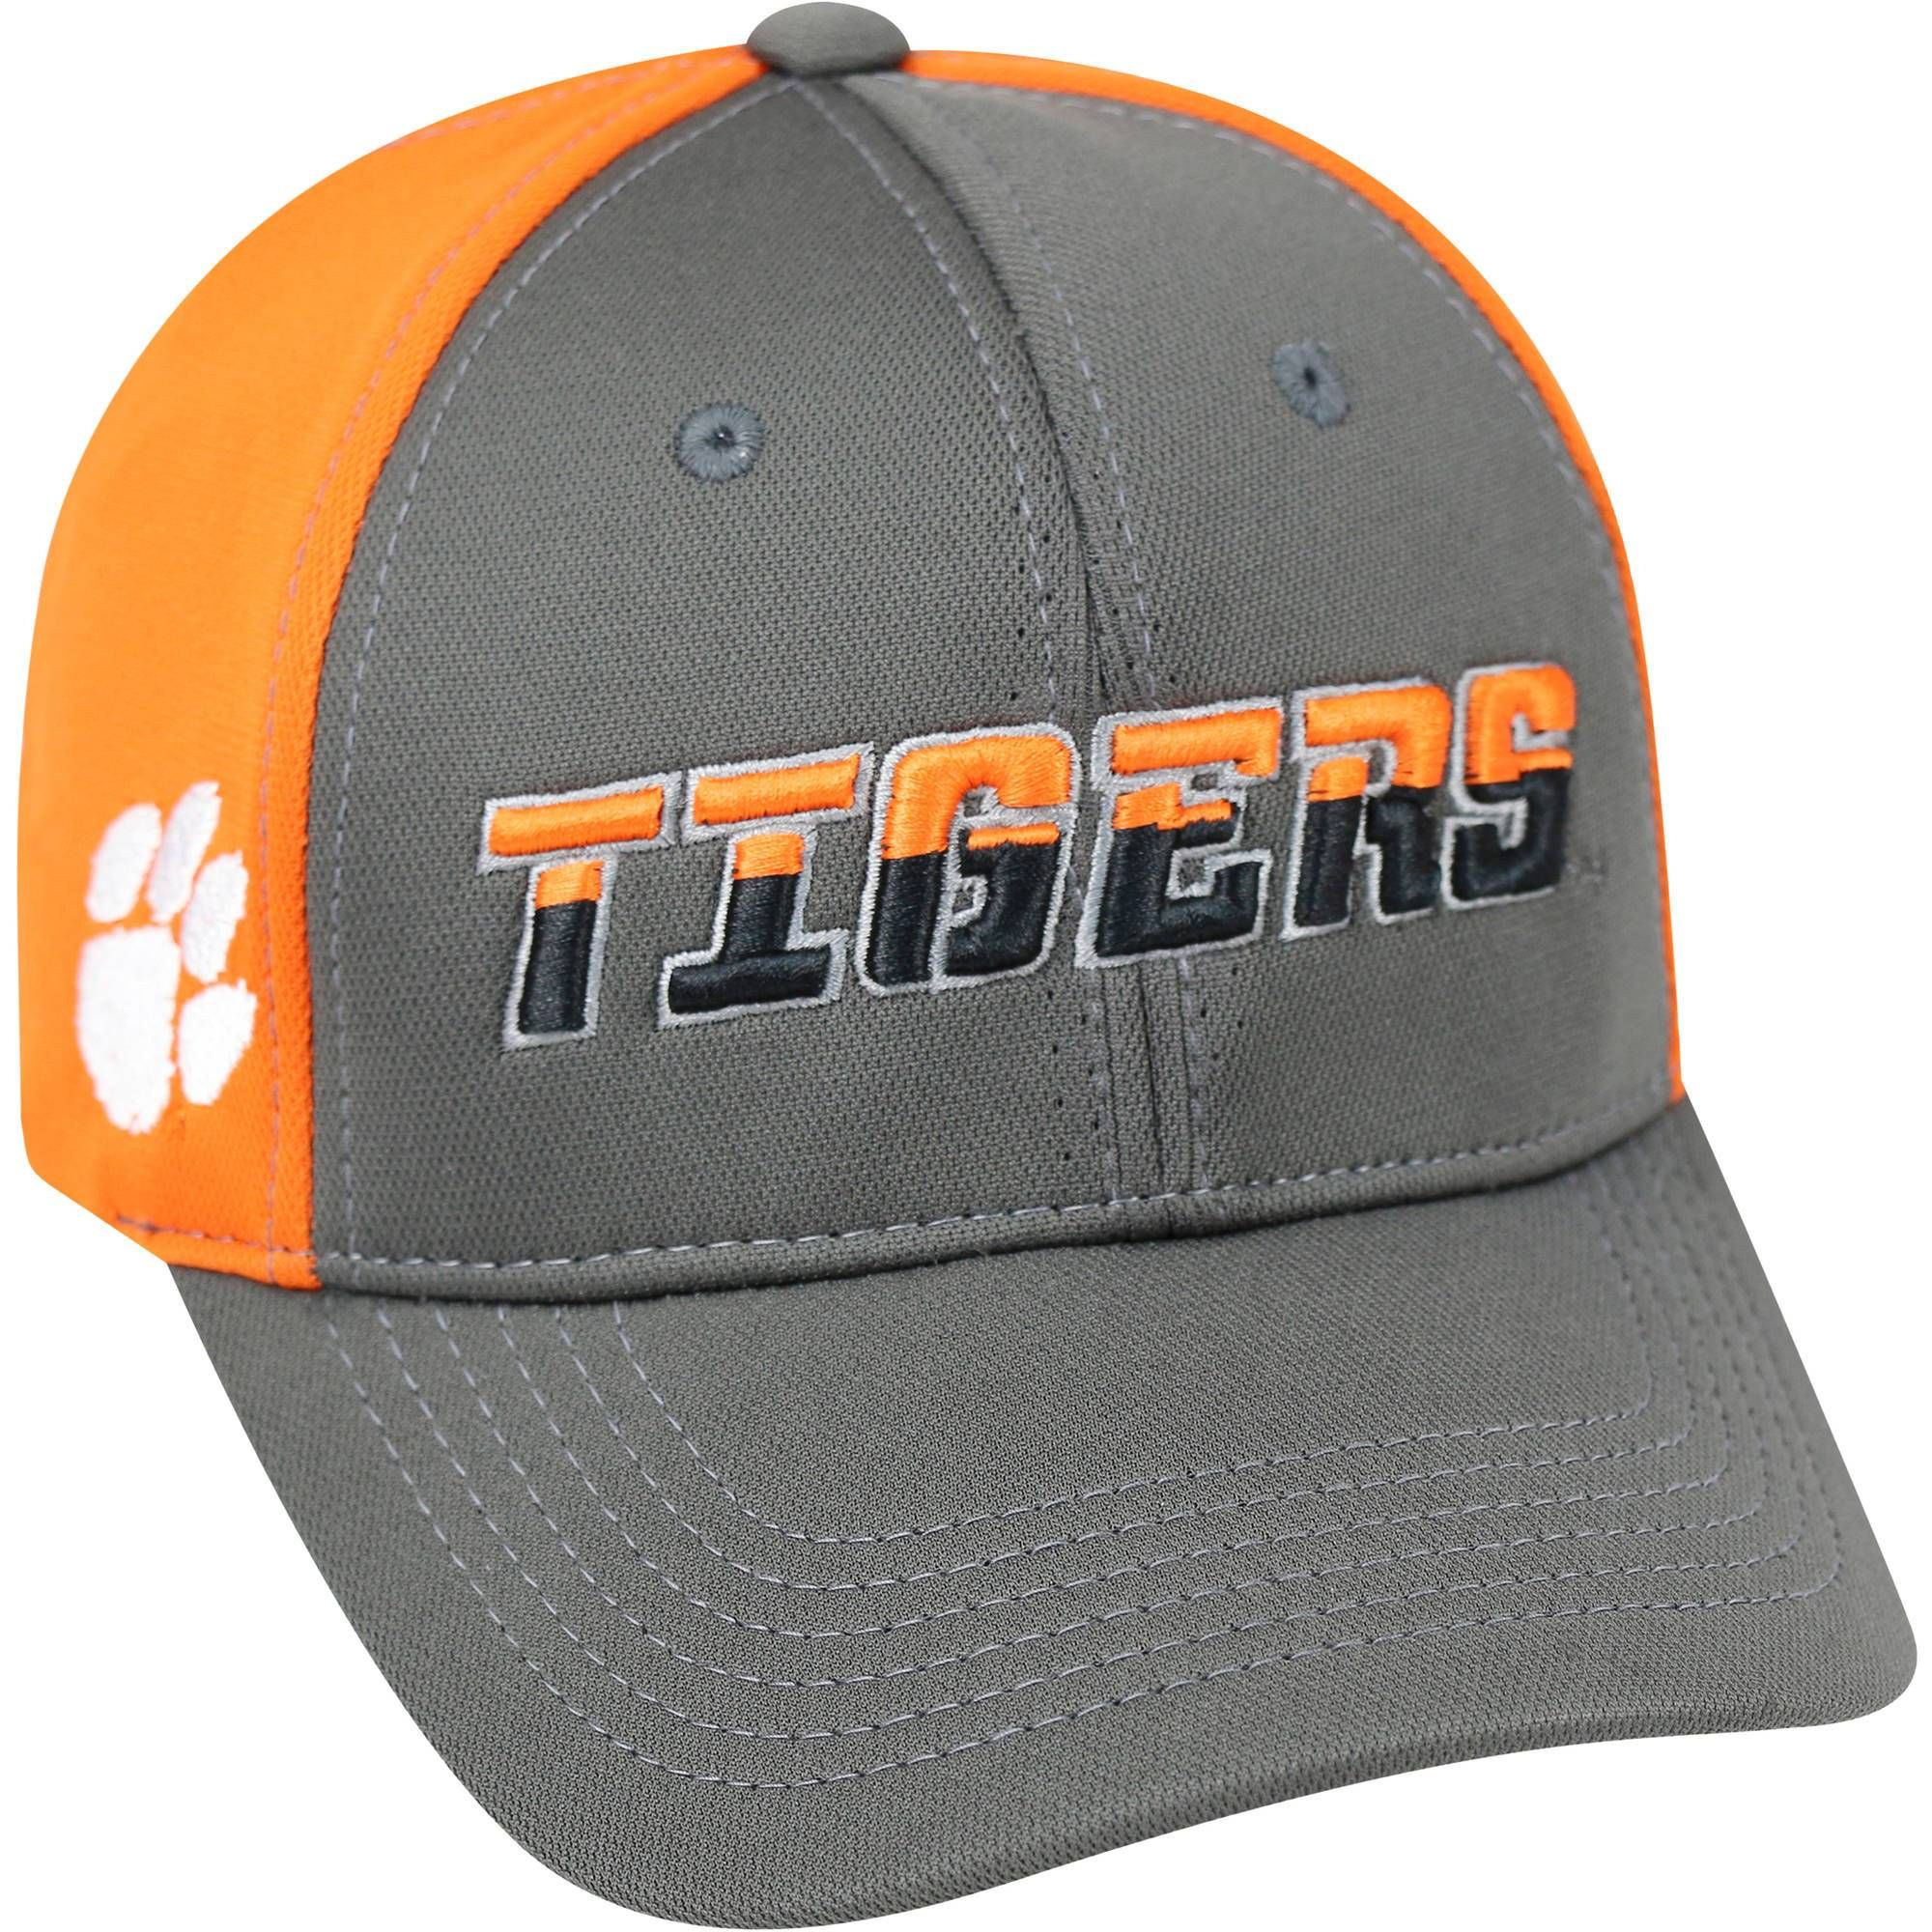 058be09fbd8 Clemson Tigers NCAA Mens Adjustable Ball Cap Hat - Orange Gray in ...